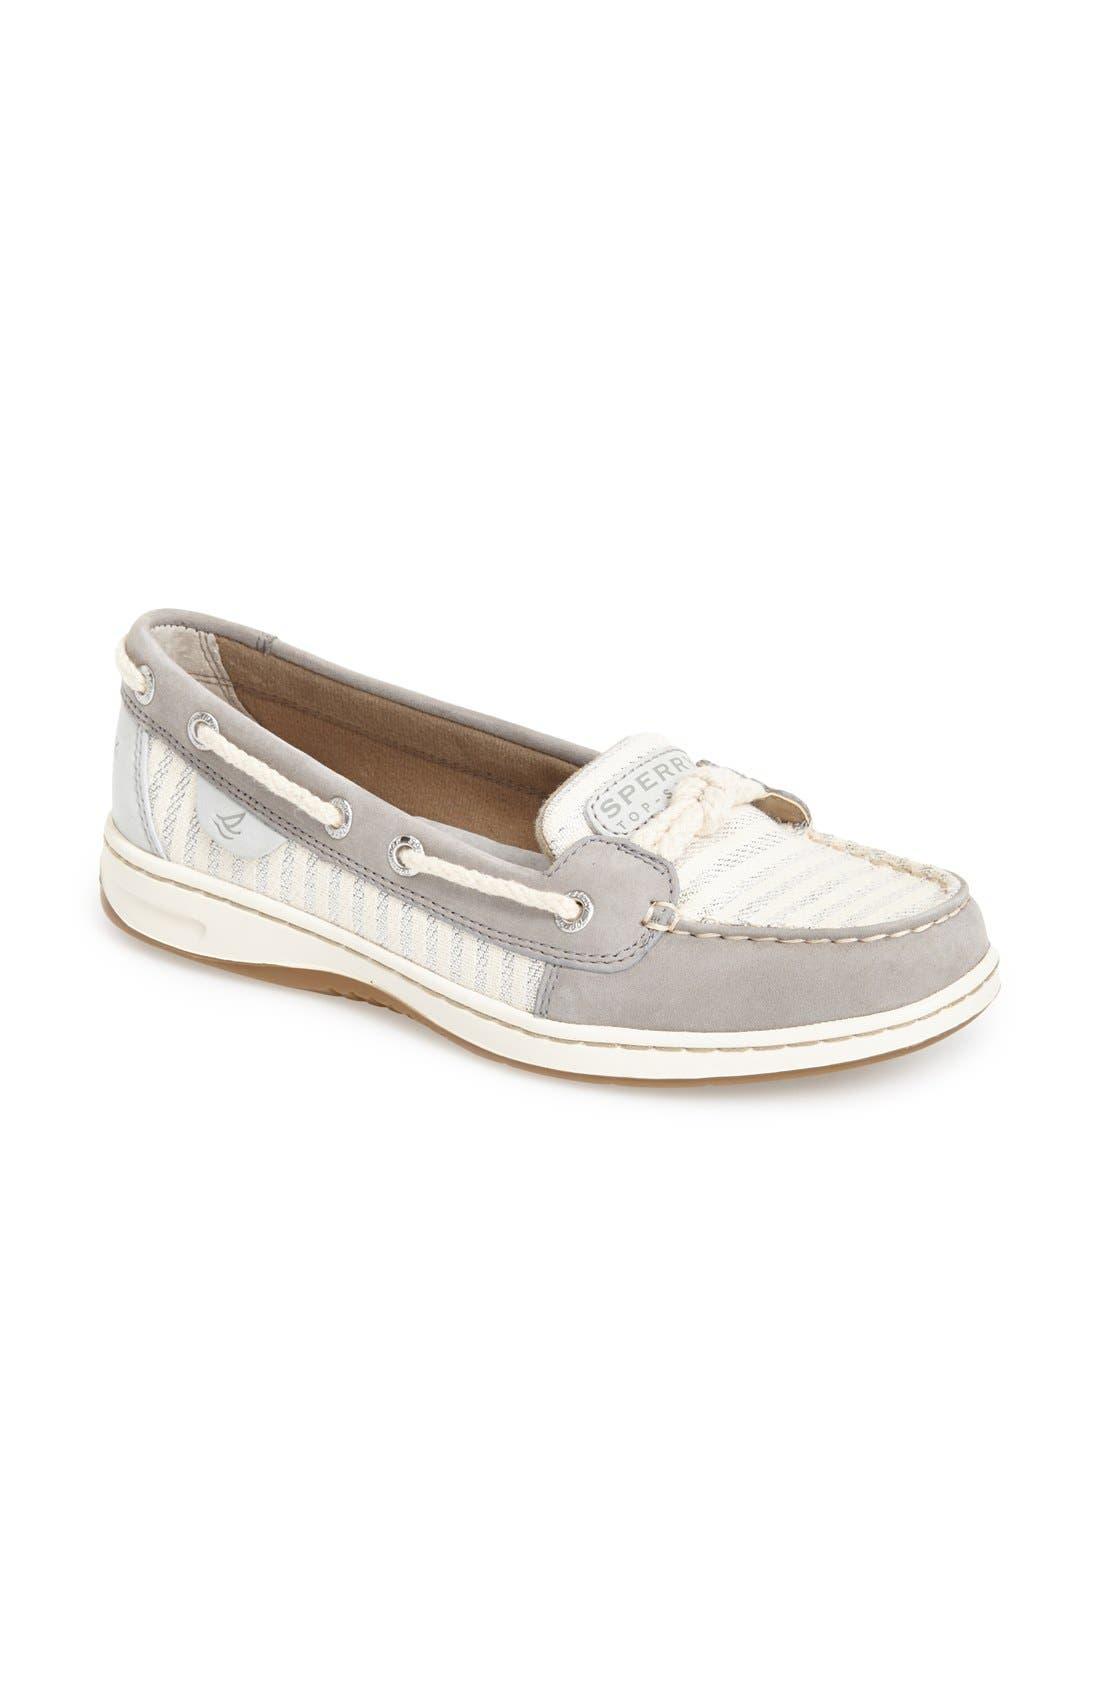 Alternate Image 1 Selected - Sperry 'Cherubfish - Mariner Stripe' Boat Shoe (Women)